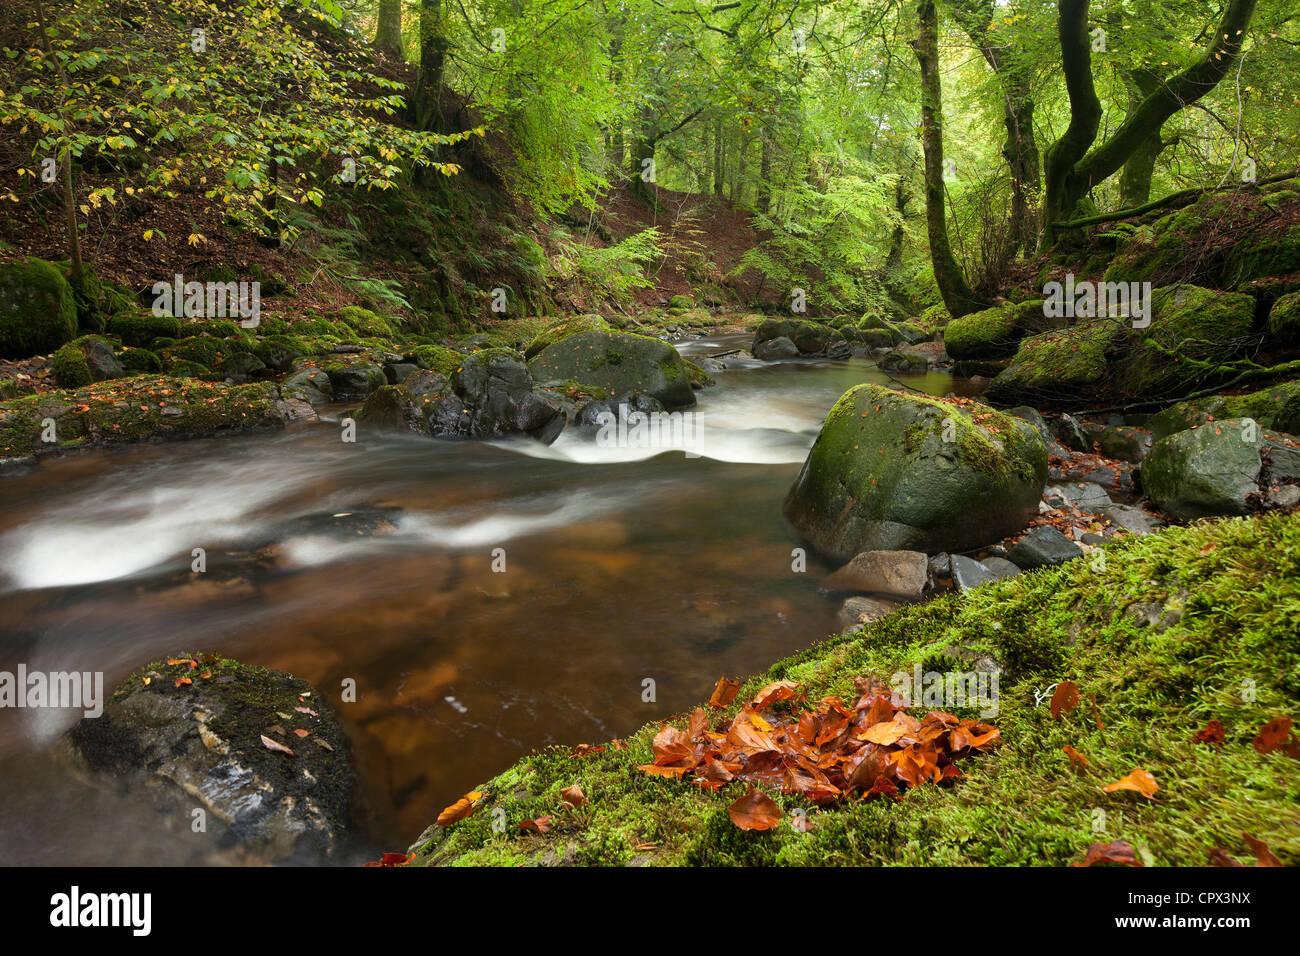 the Birks of Aberfeldy, Perthshire, Scotland - Stock Image